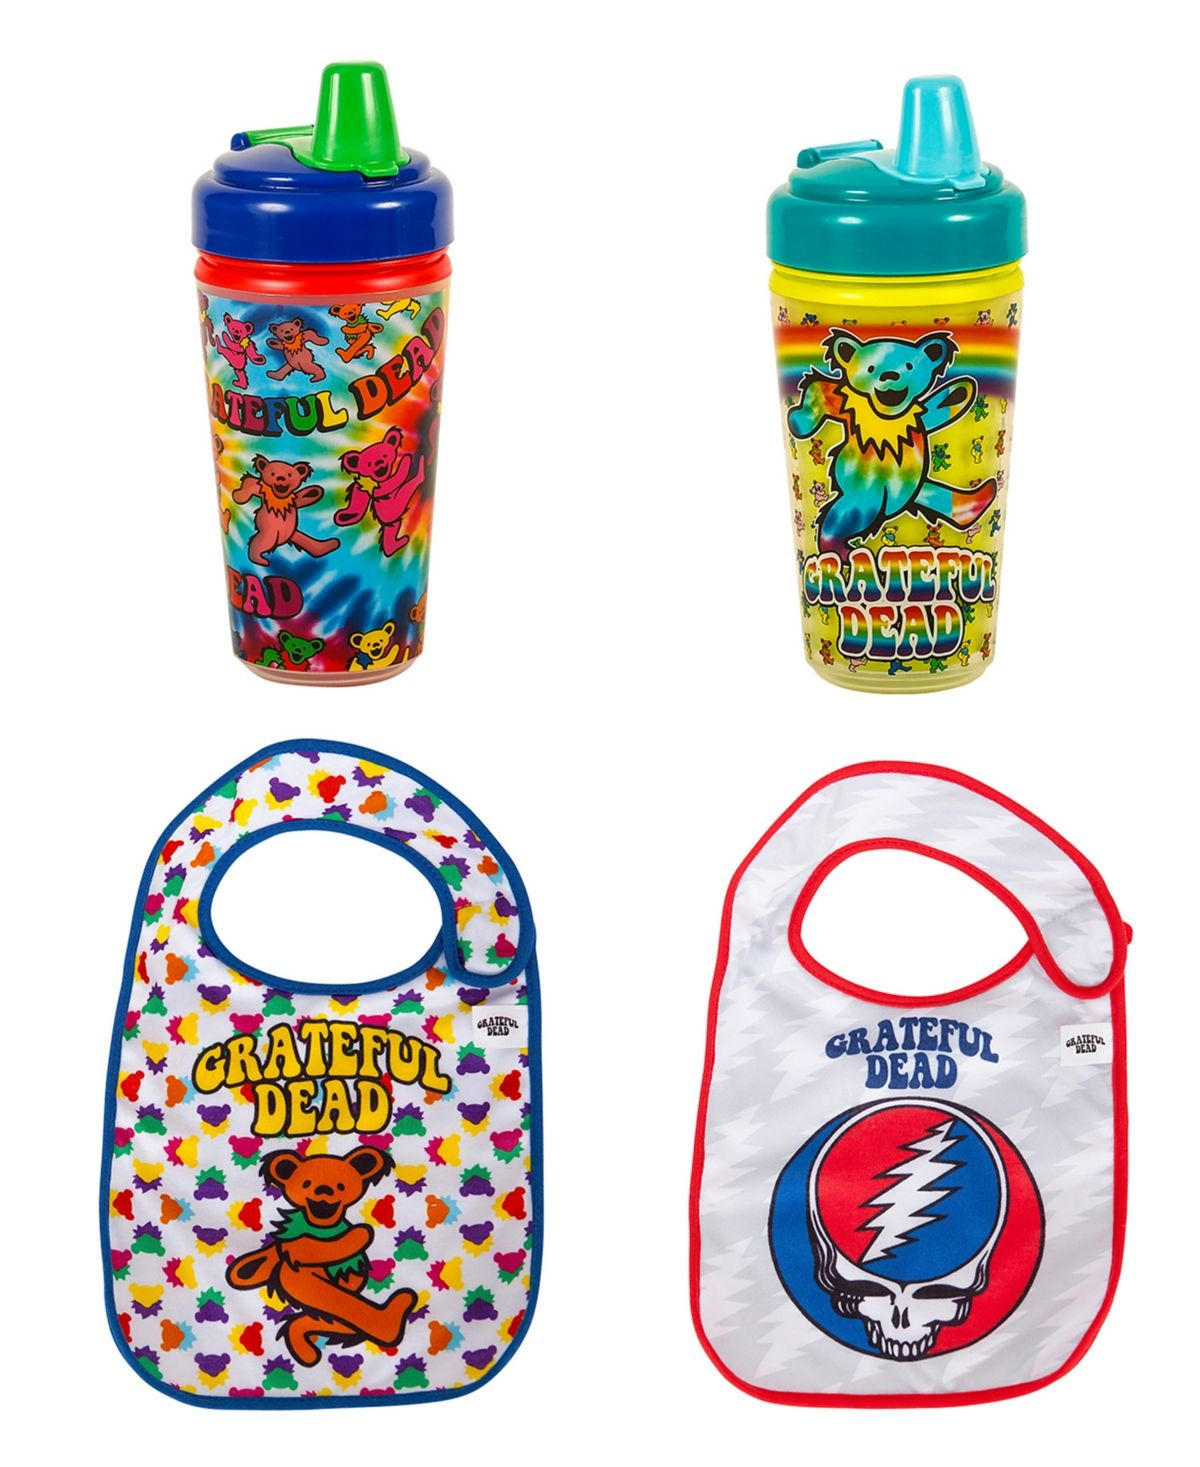 Daphyl S 2 Pack Grateful Dead Toddler Feeder Set Reviews All Baby Gear Essentials Kids Macy S In 2020 Grateful Dead Dancing Bears Baby Gear Essentials Baby Gear